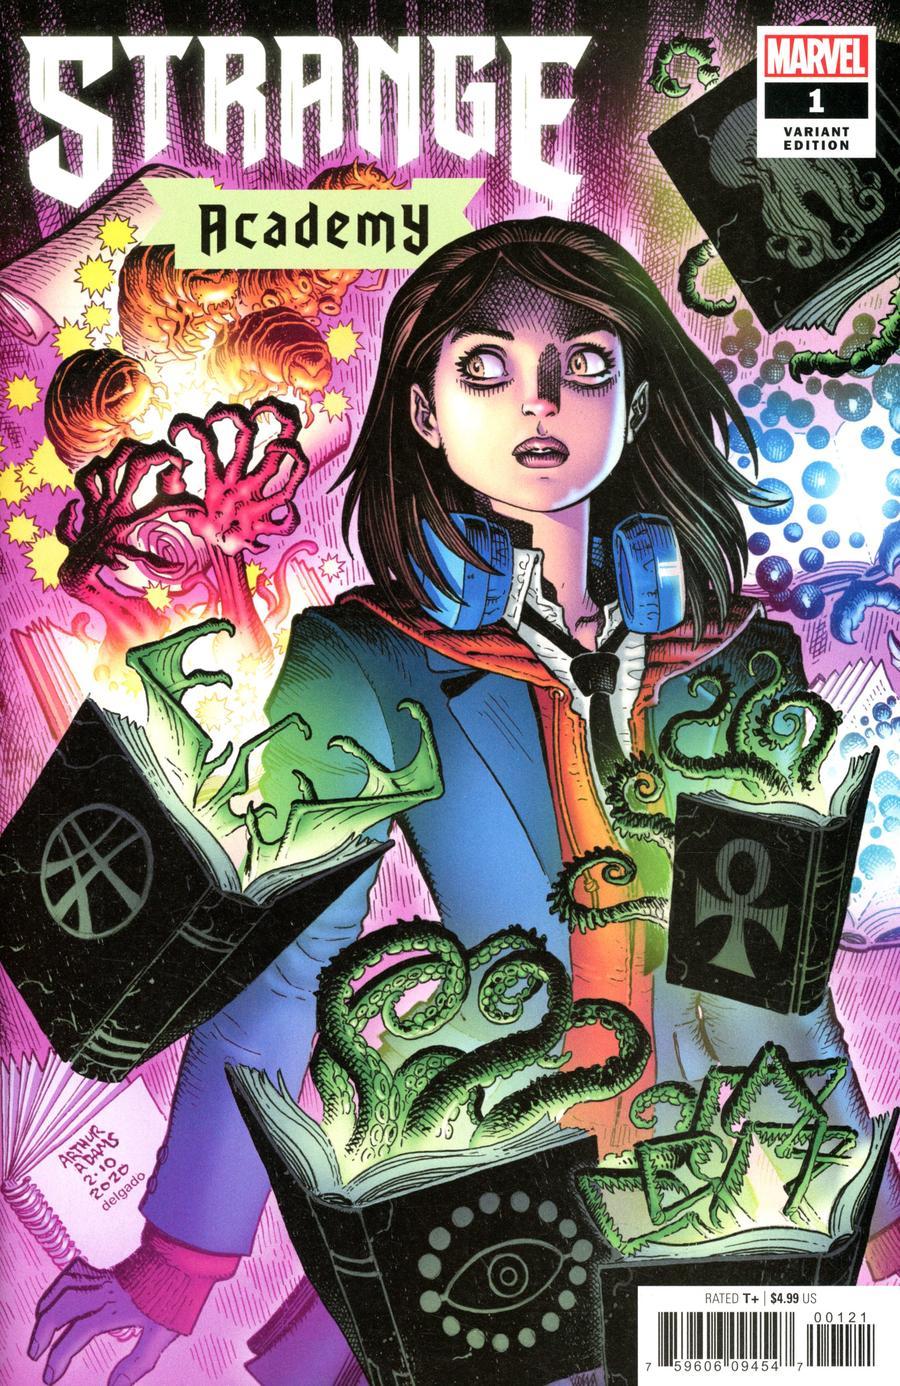 Strange Academy #1 Cover B Variant Arthur Adams Character Spotlight Cover